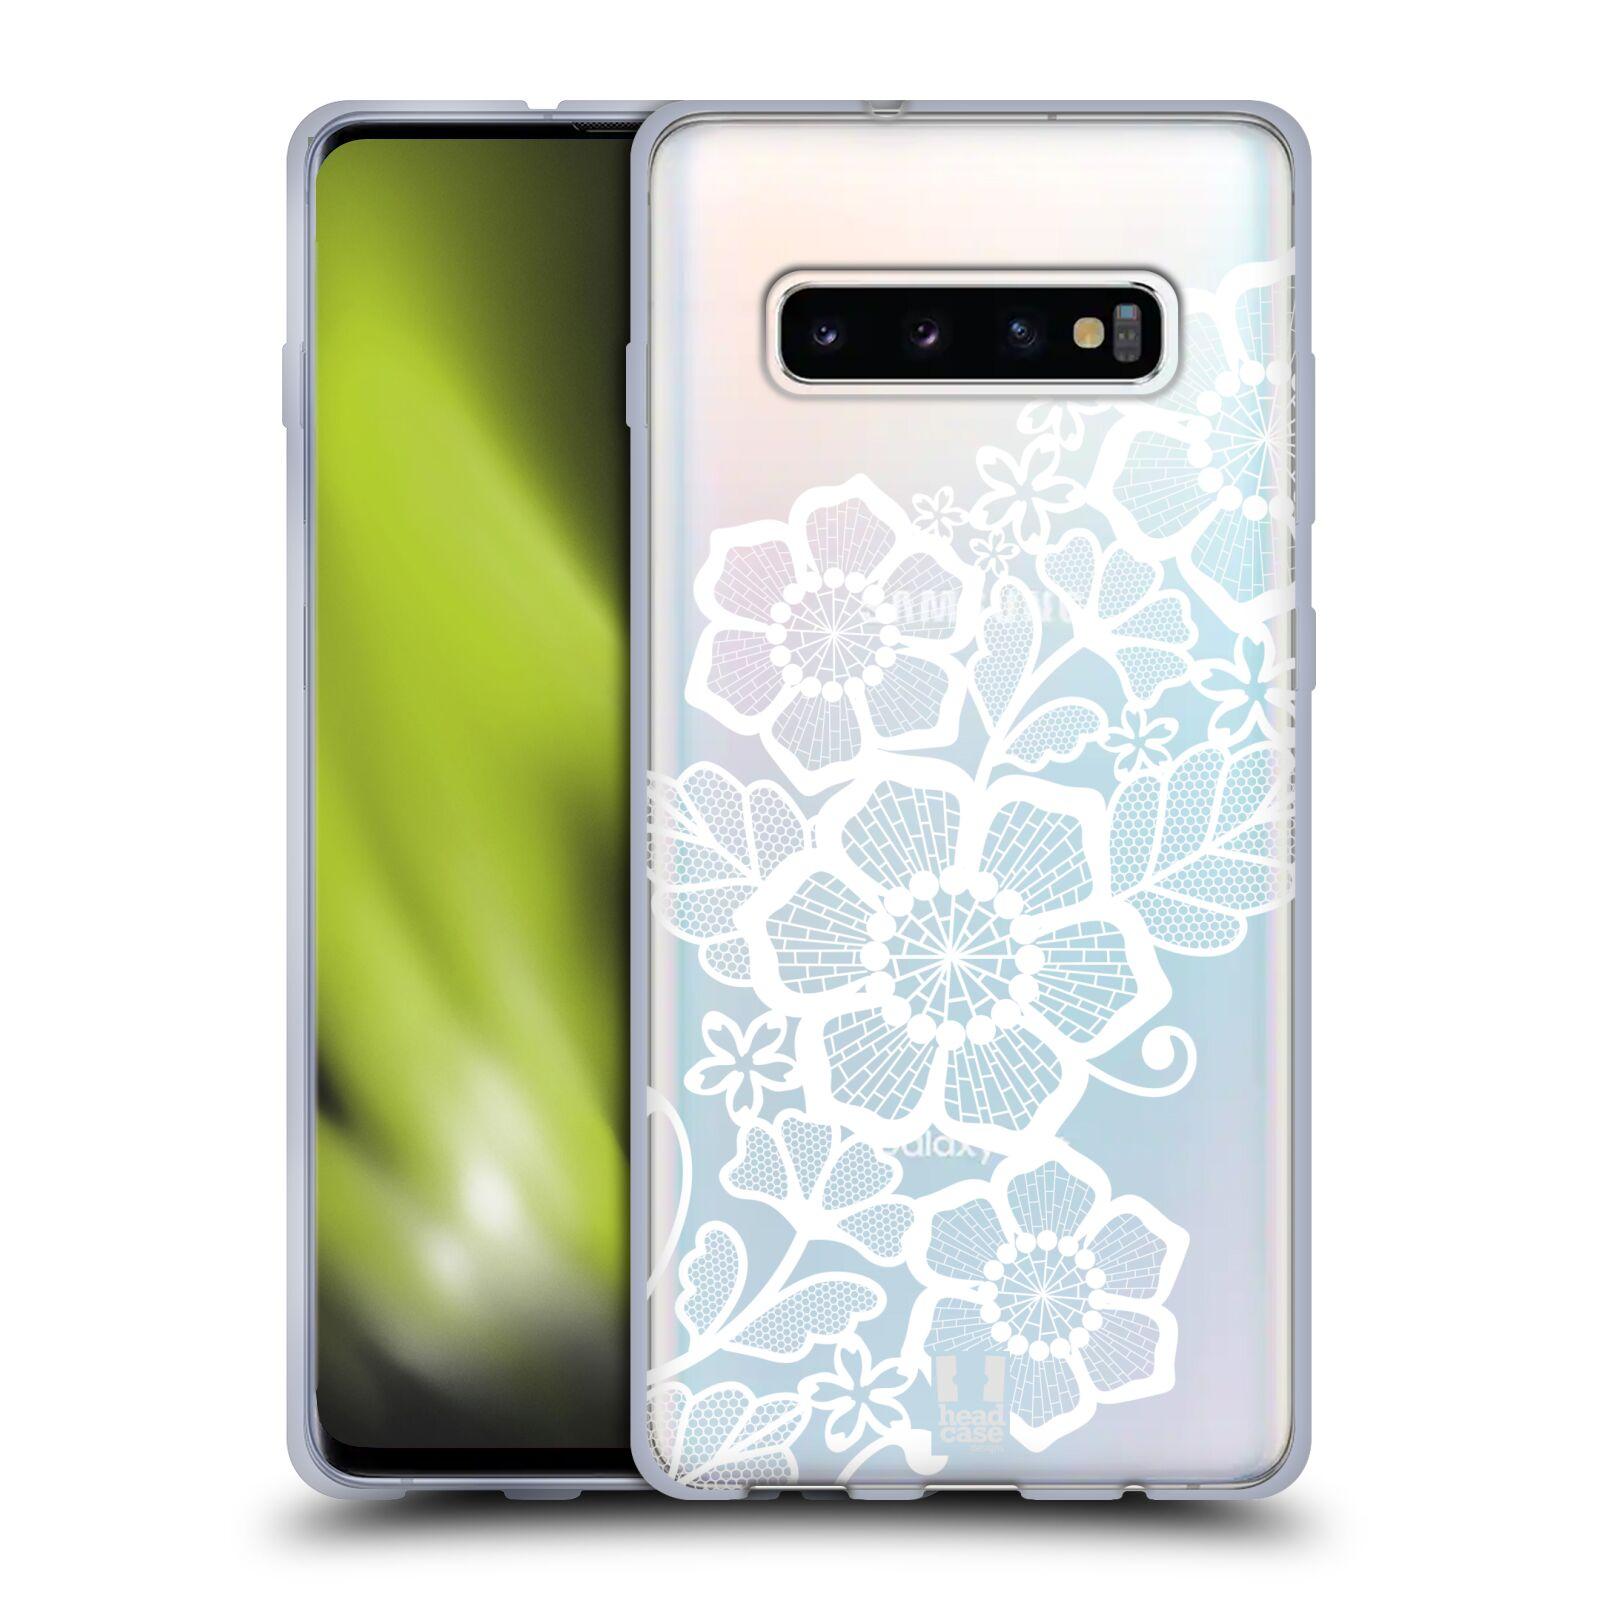 Silikonové pouzdro na mobil Samsung Galaxy S10 Plus - Head Case - Bílé krajkové květy